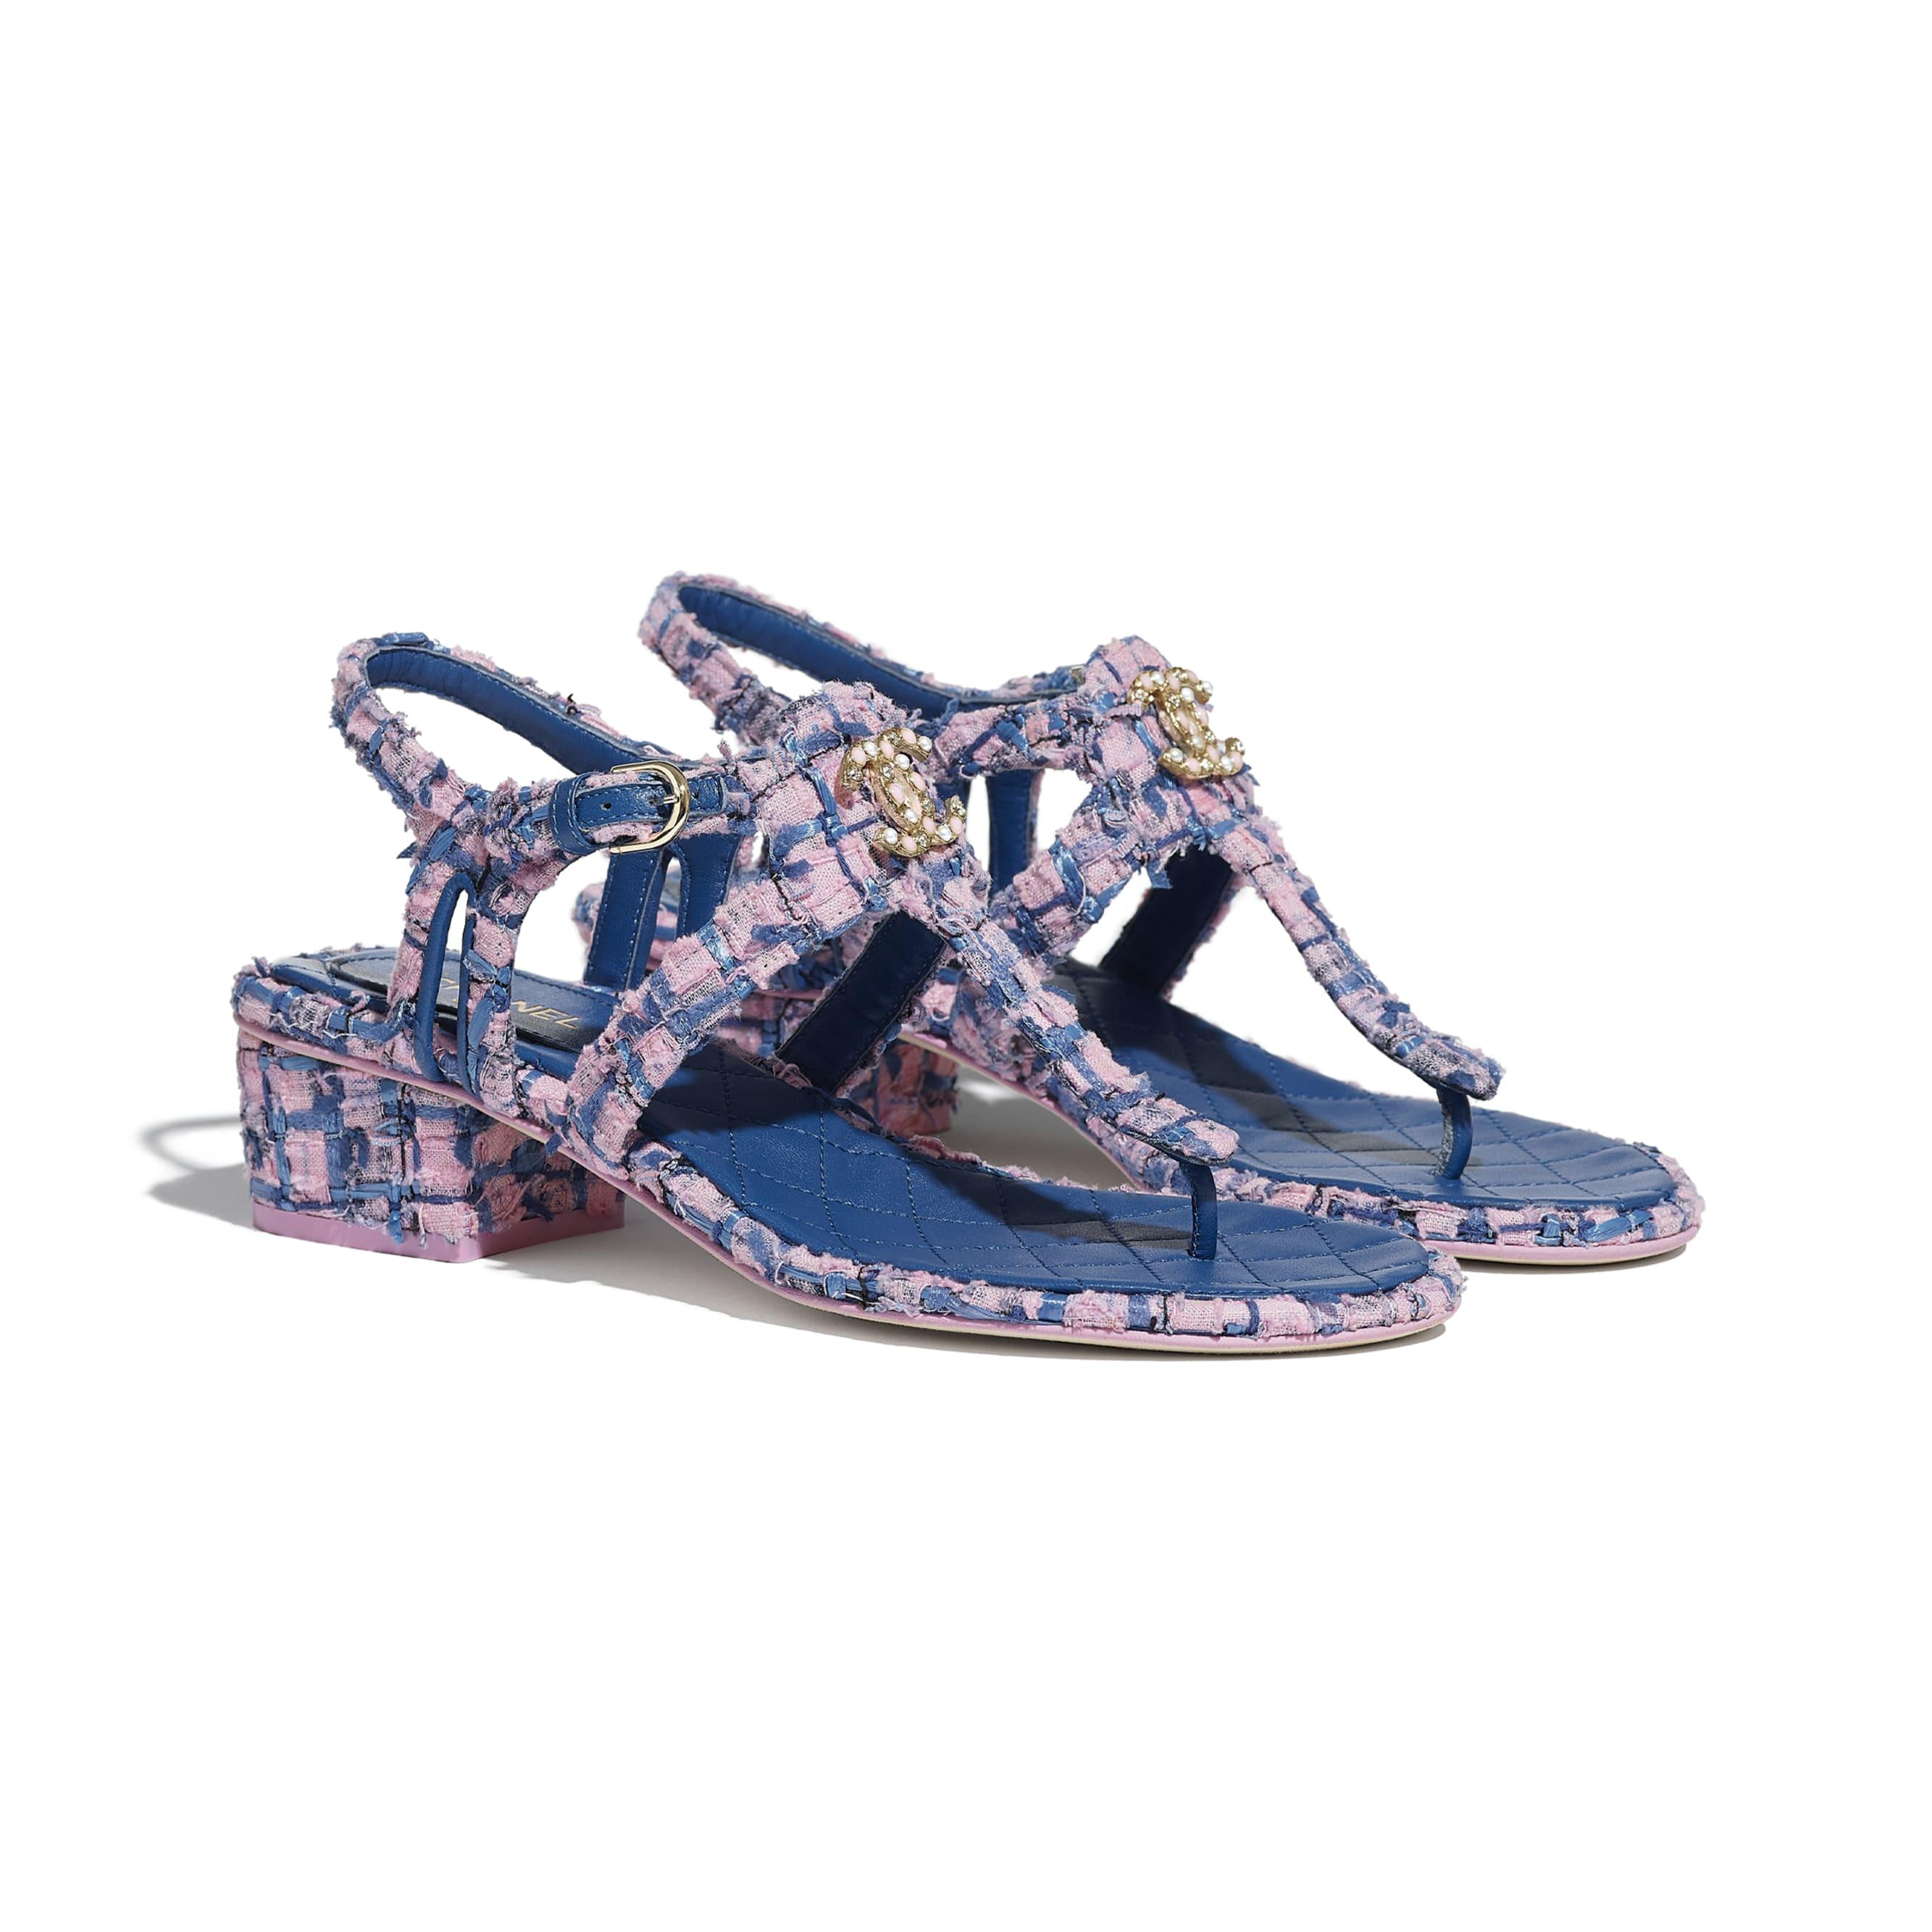 Sandálias - Pink, Blue & Navy Blue - Tweed - CHANEL - Vista alternativa - ver a versão em tamanho standard